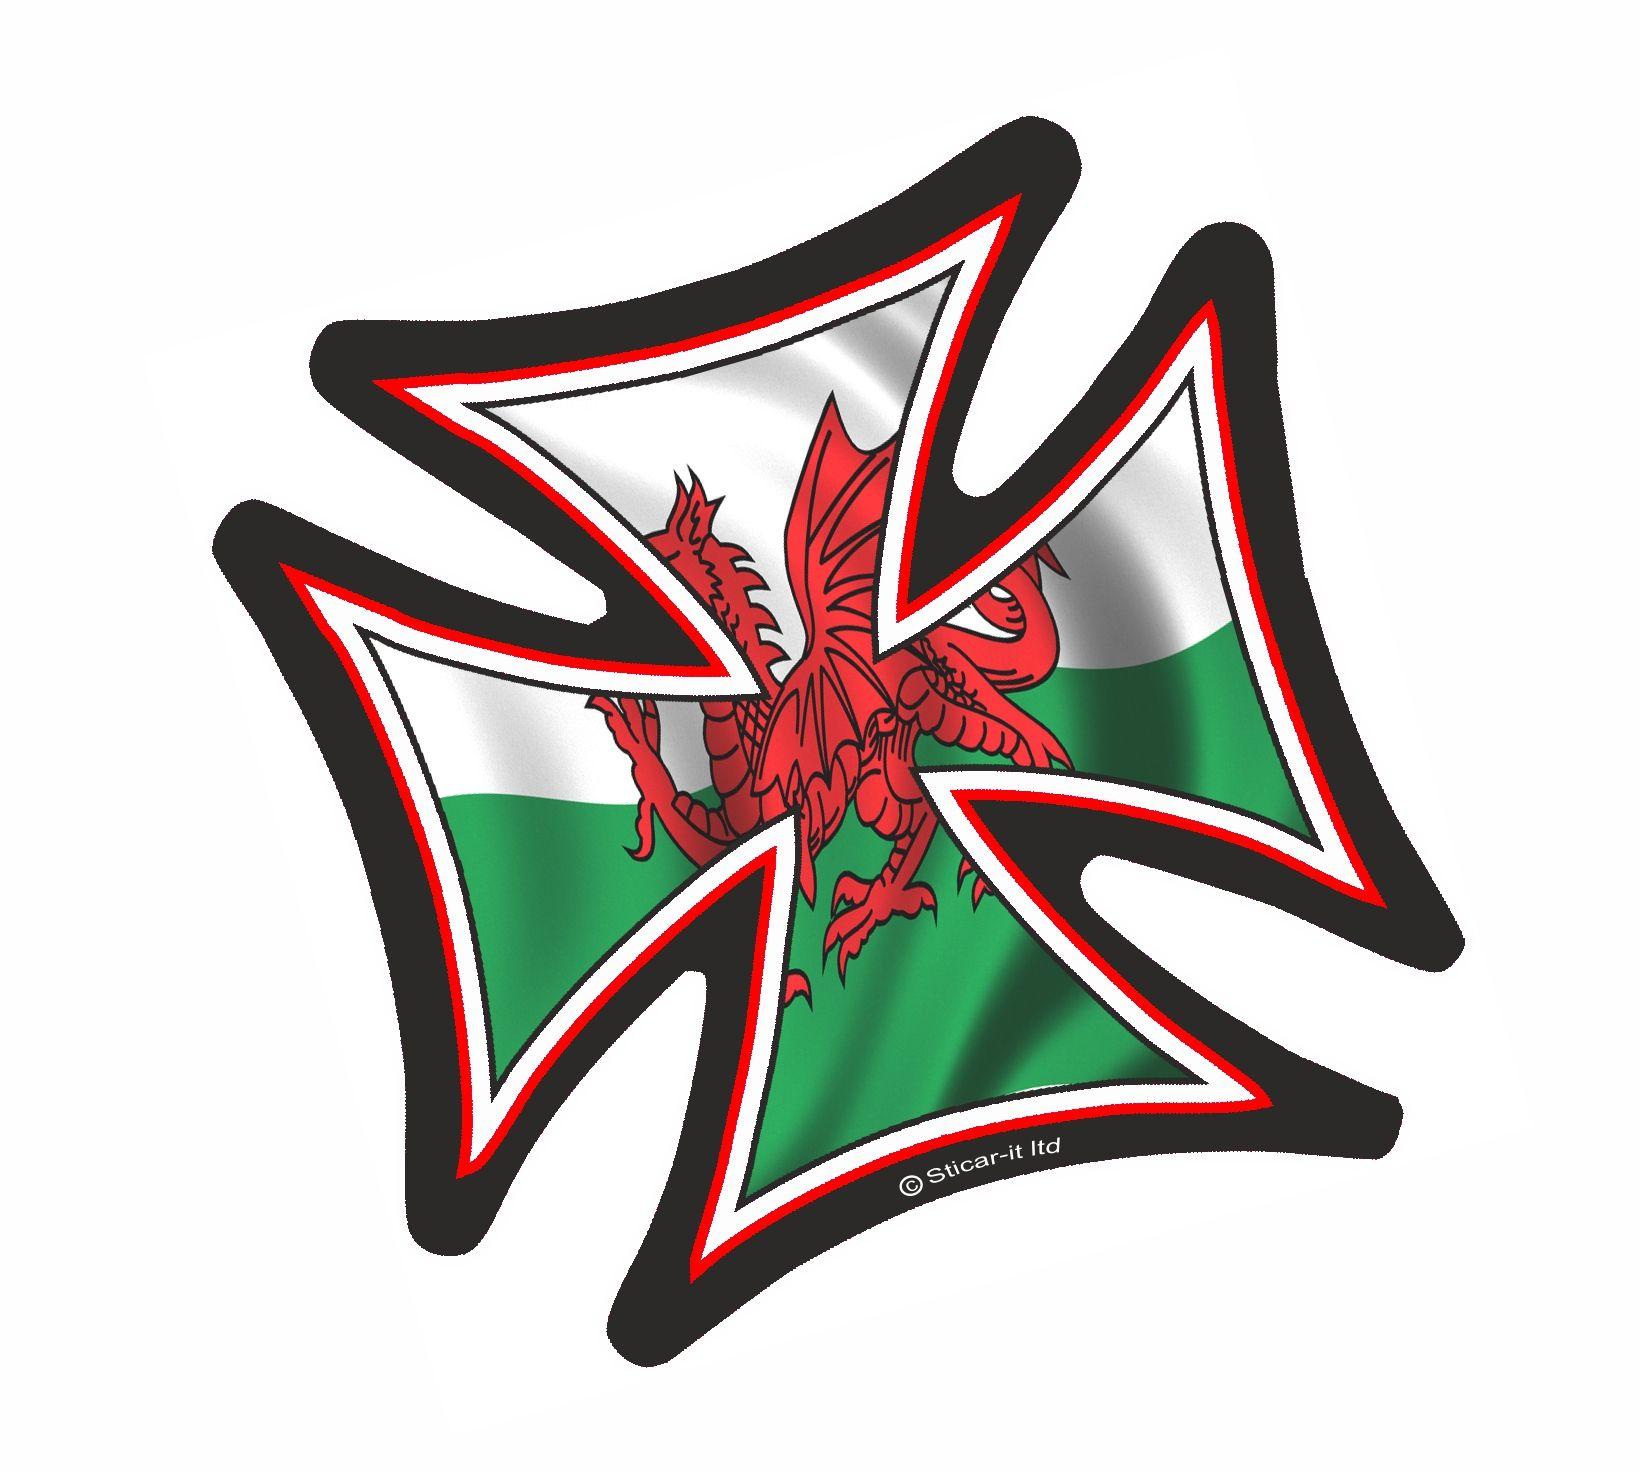 Iron Cross With Welsh Dragon Wales Cymru Flag Motif